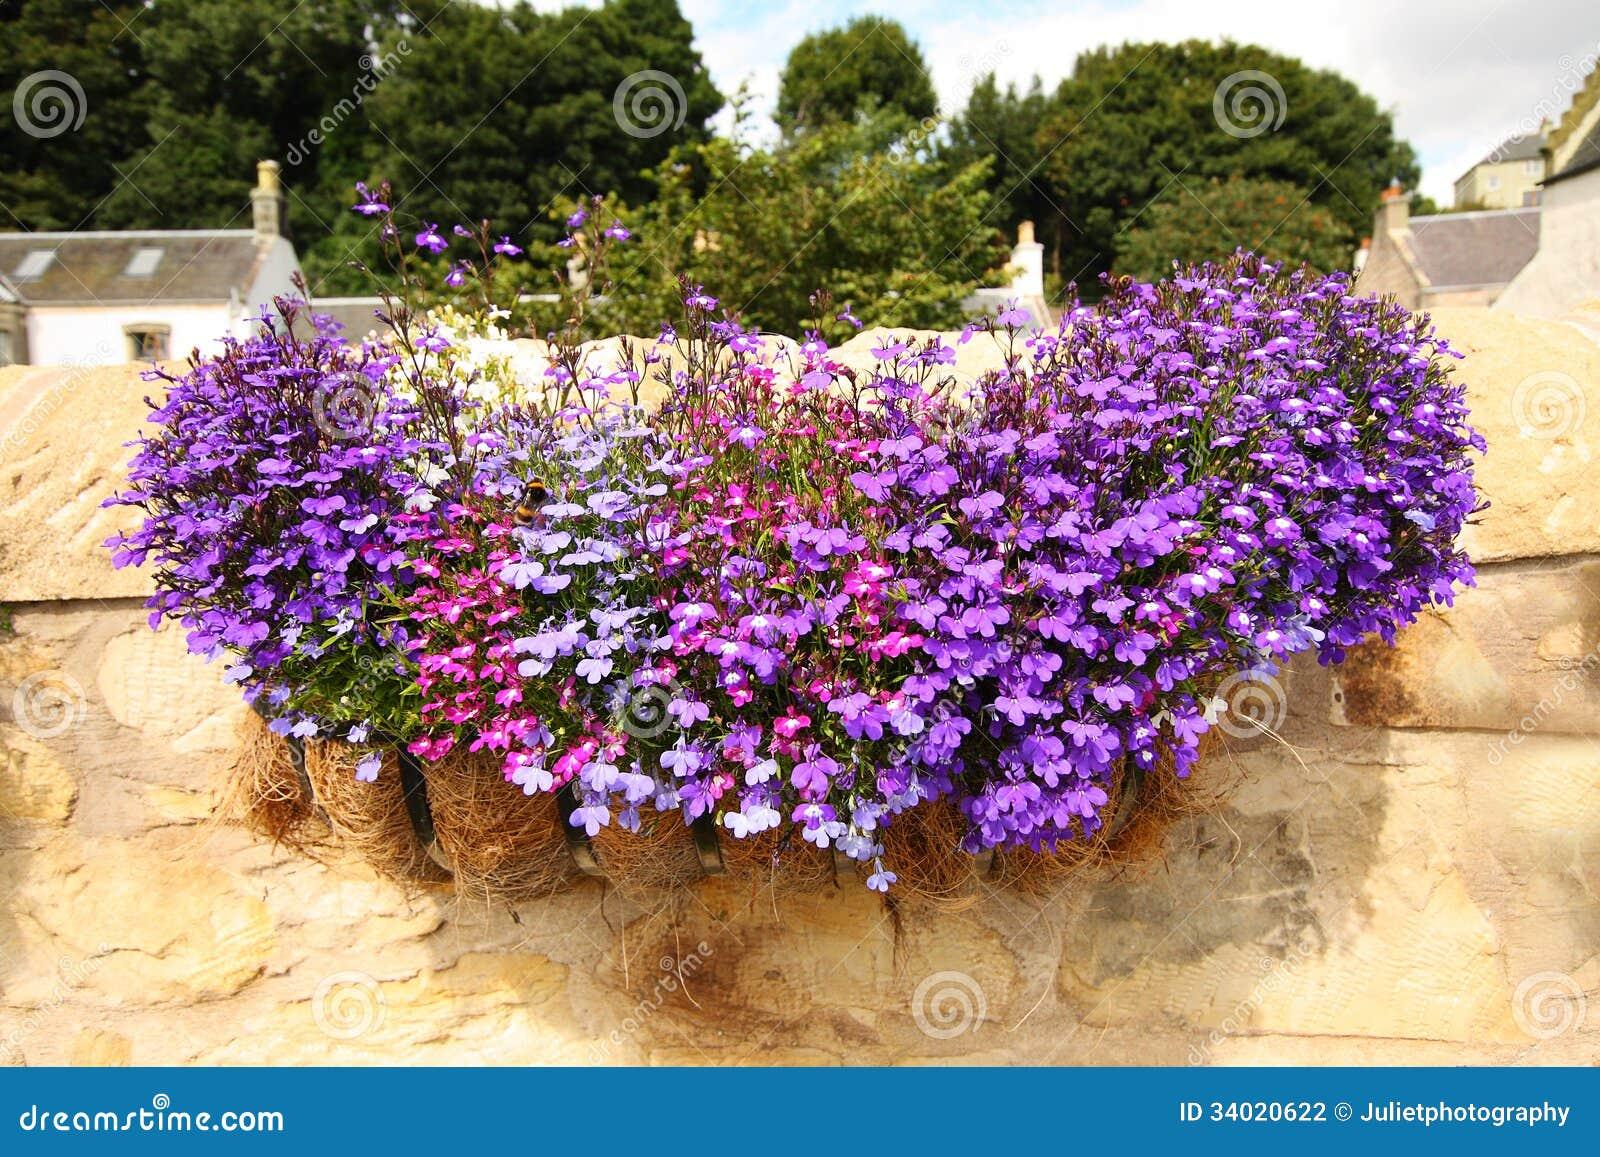 Beautiful flowers basket 3280986 spojivachfo filgiftshop free shipping send flowers and gifts izmirmasajfo